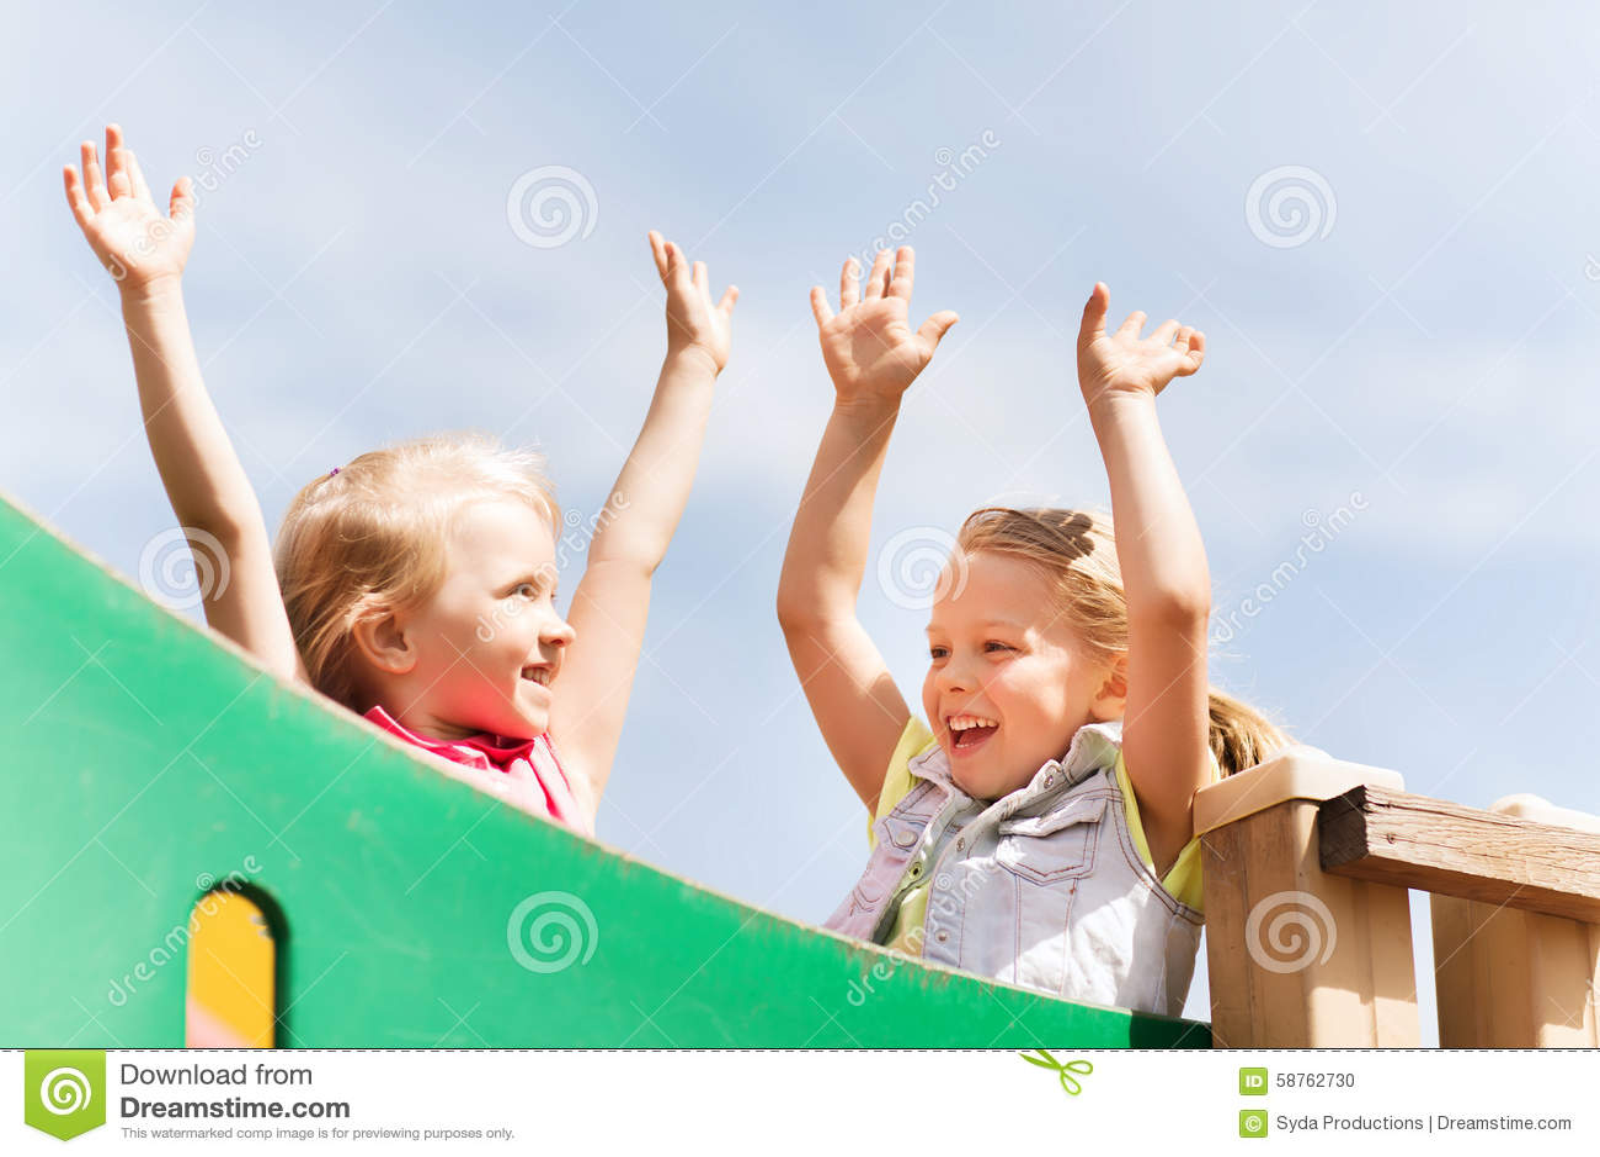 Happy Girls Waving Hands On Children Playground Stock ...